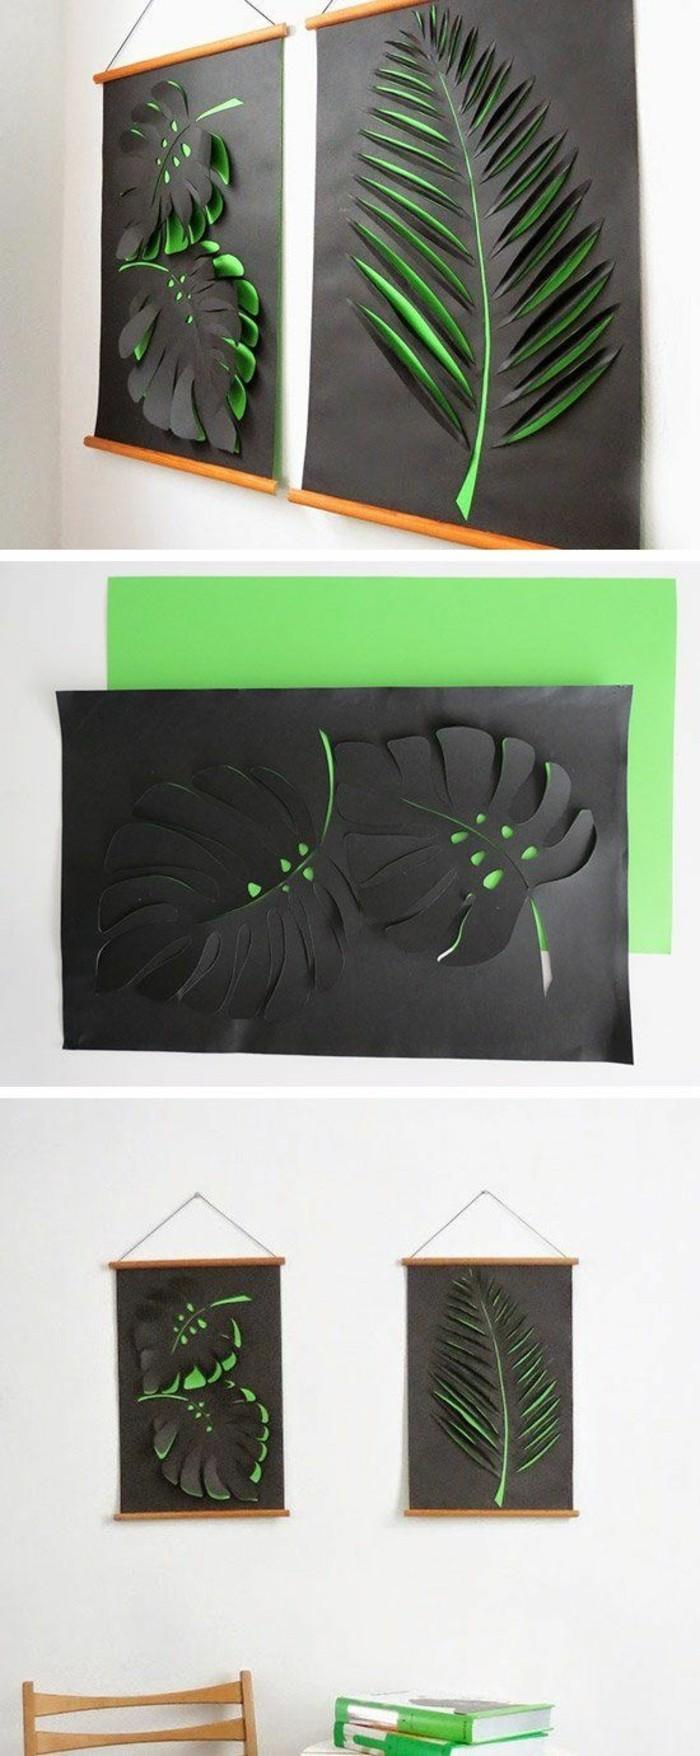 wanddeko-selber-machen-wanddekoration-ideen-3d-blatter-aus-grunem-und-schwarzem-papier